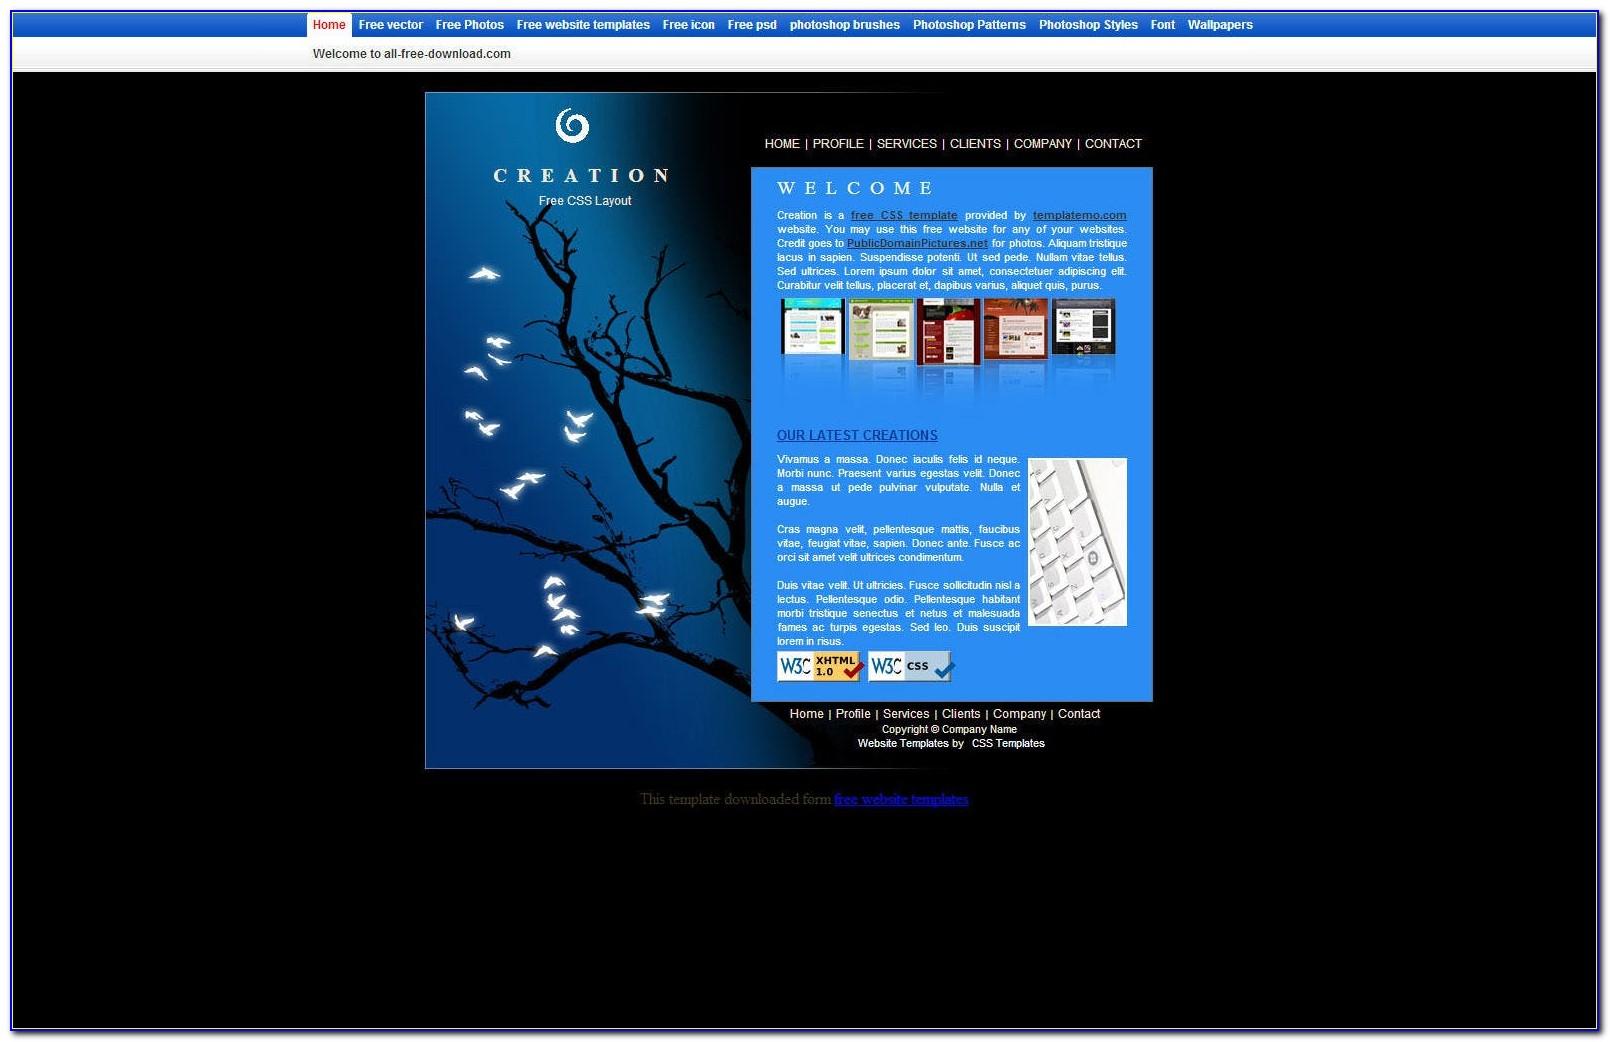 Dreamweaver Template Responsive Free